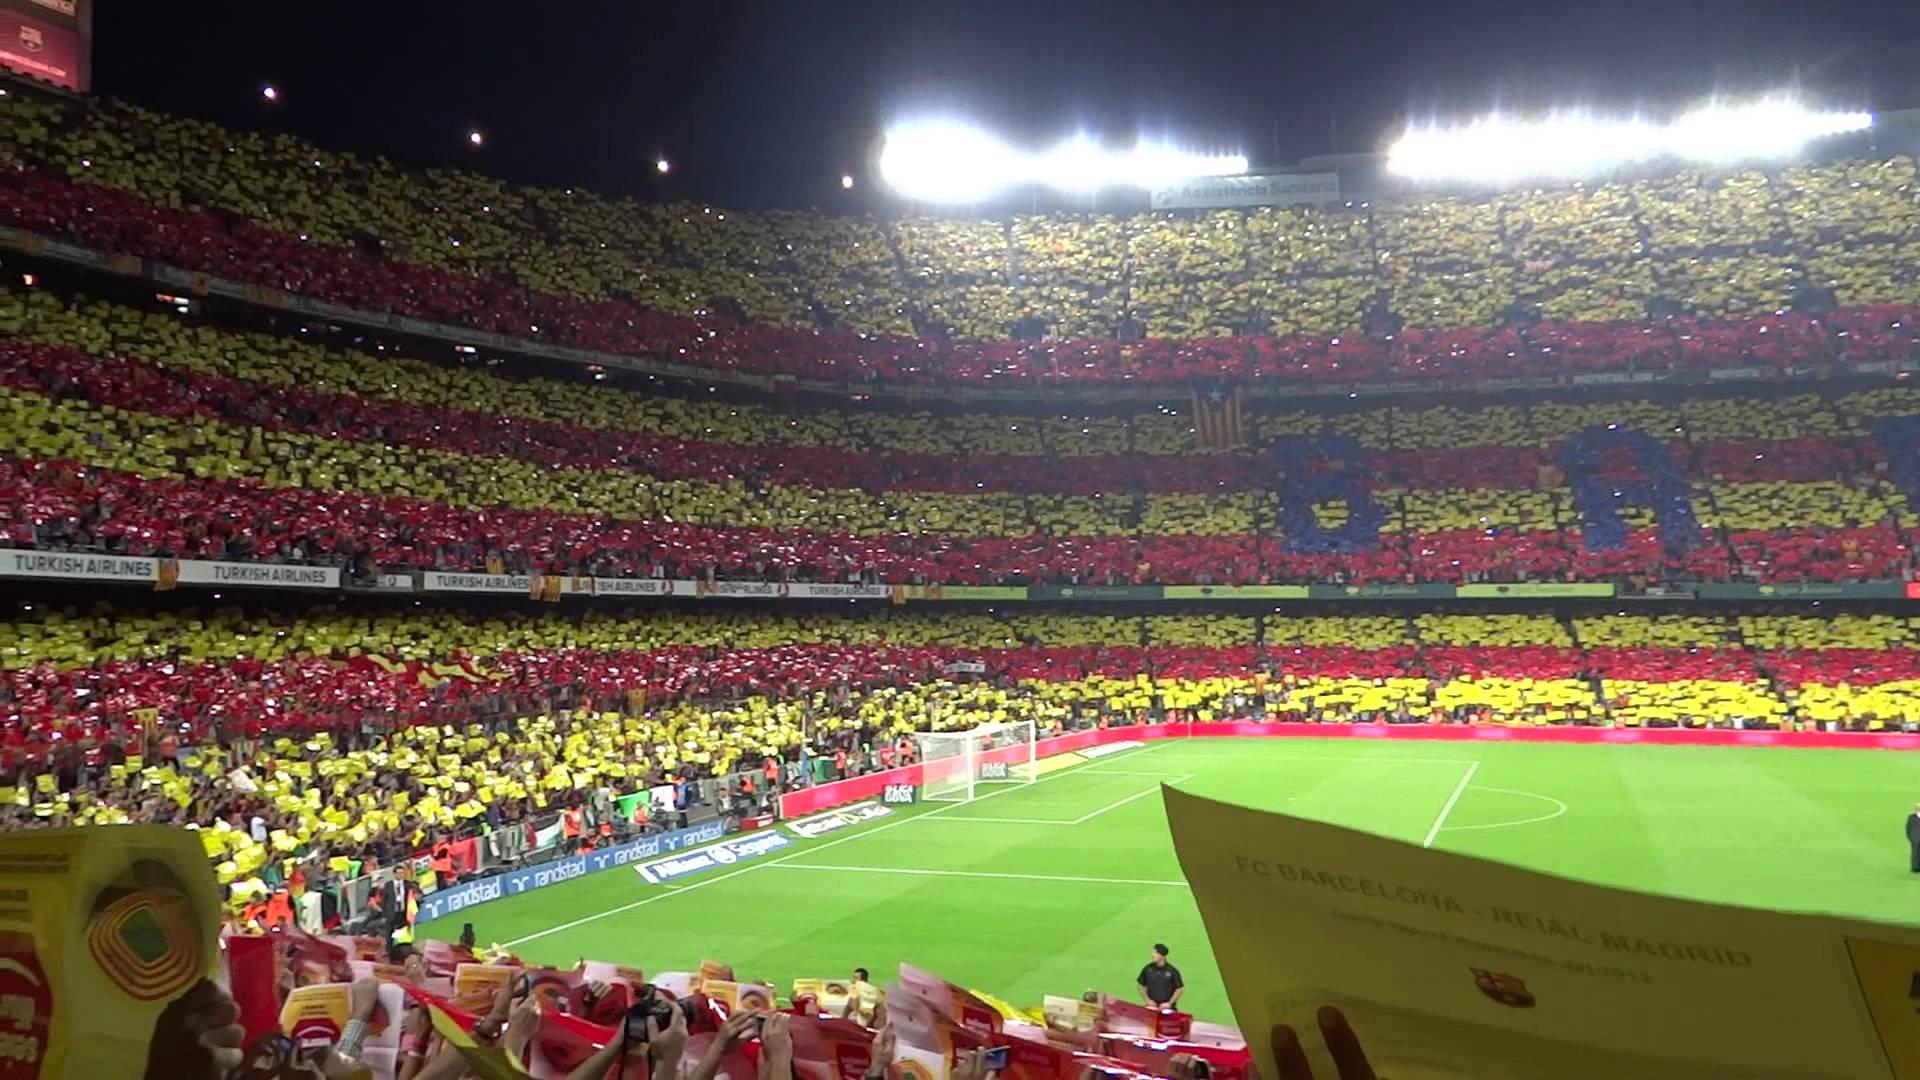 Wallpapers Hd Real Madrid Camp Nou Stadium Wallpaper Download Free Pixelstalk Net